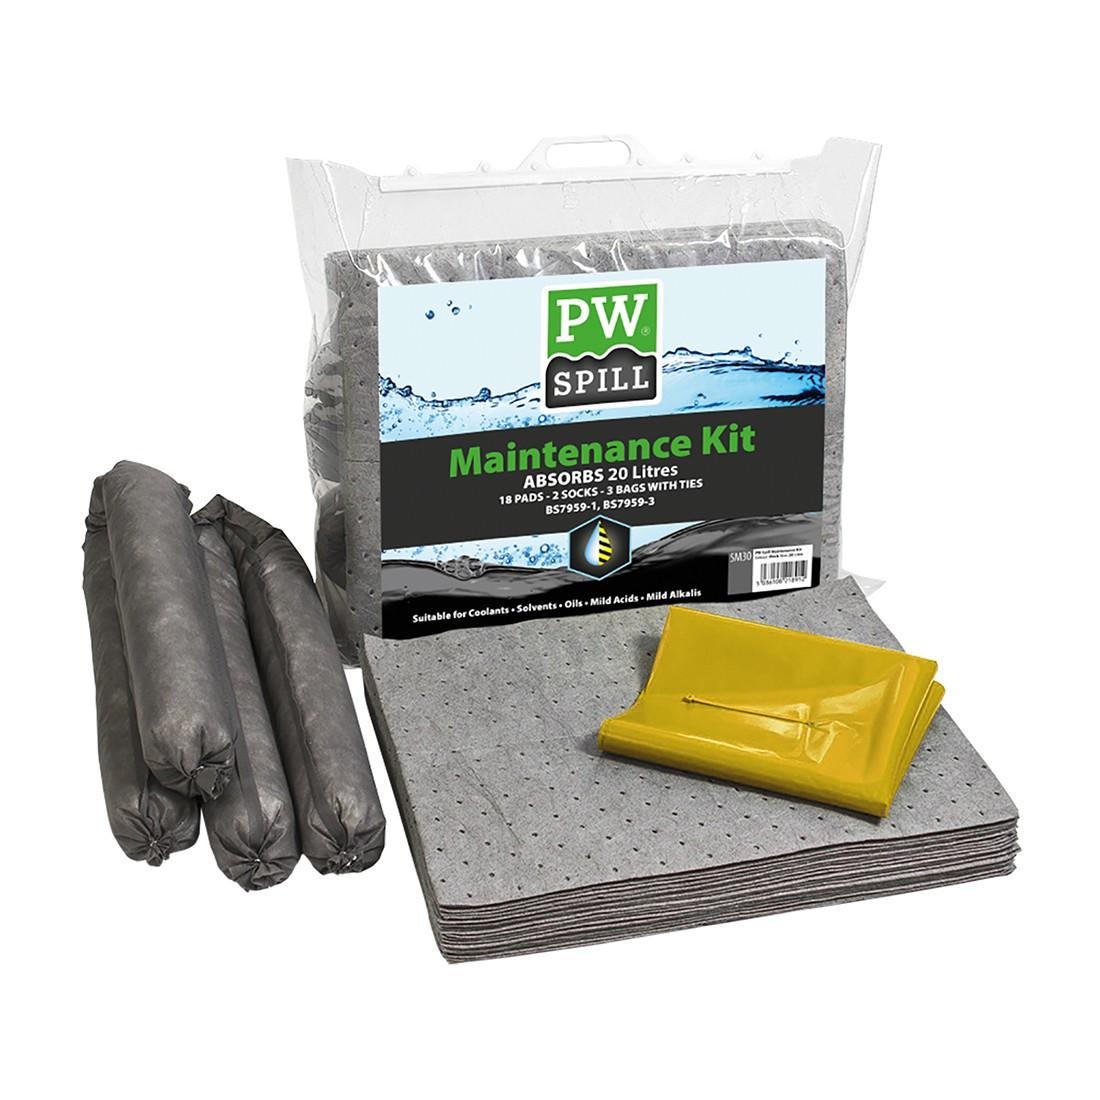 20 liter Maintenance Kit